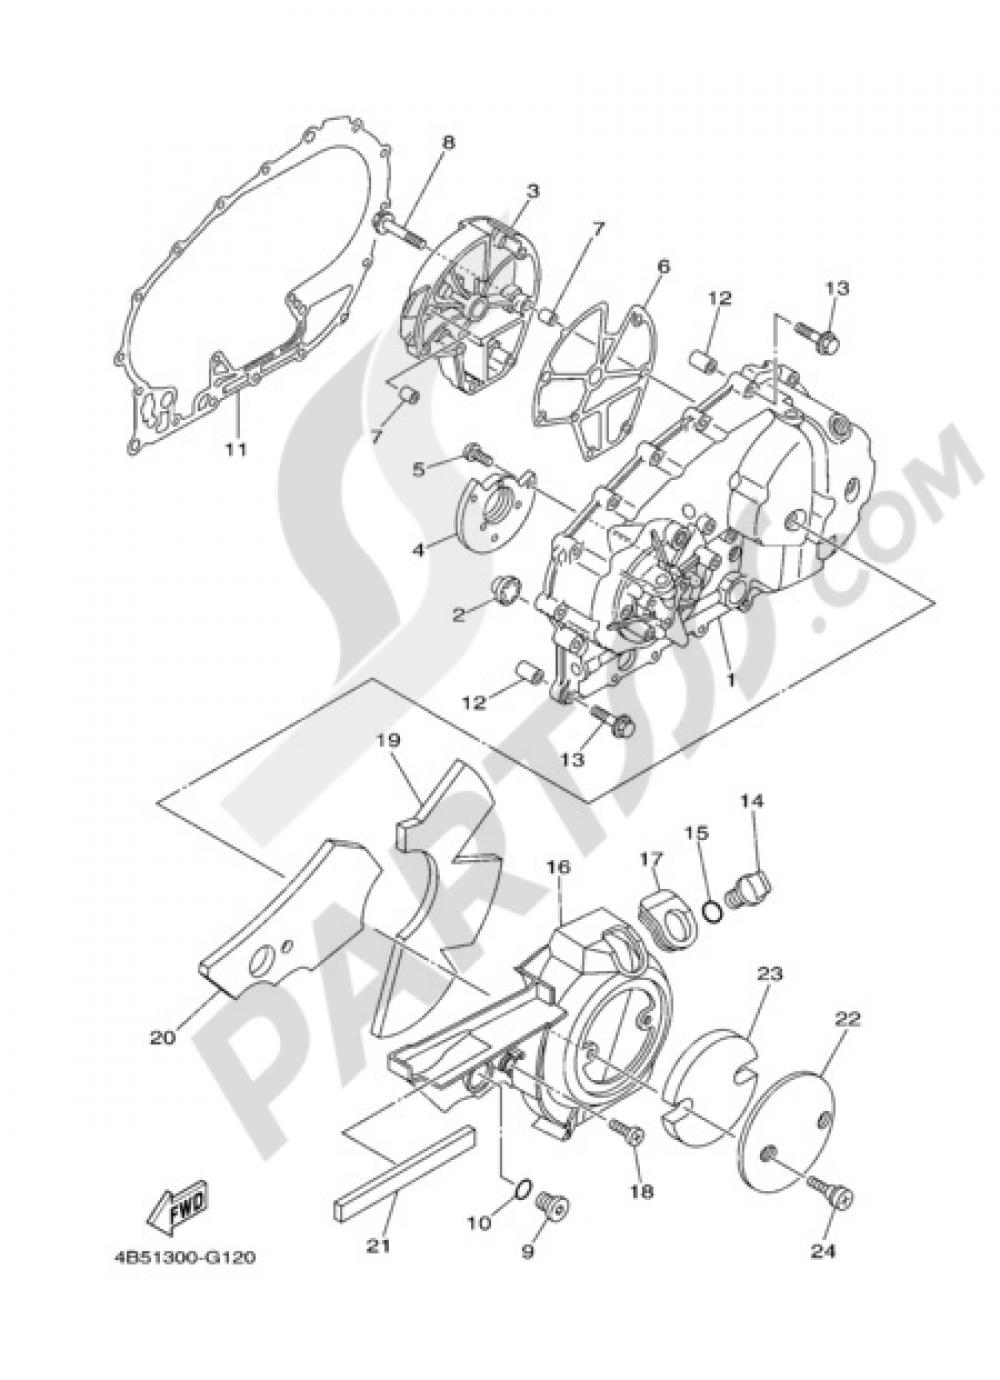 CRANKCASE COVER 1 Yamaha T-Max 2011